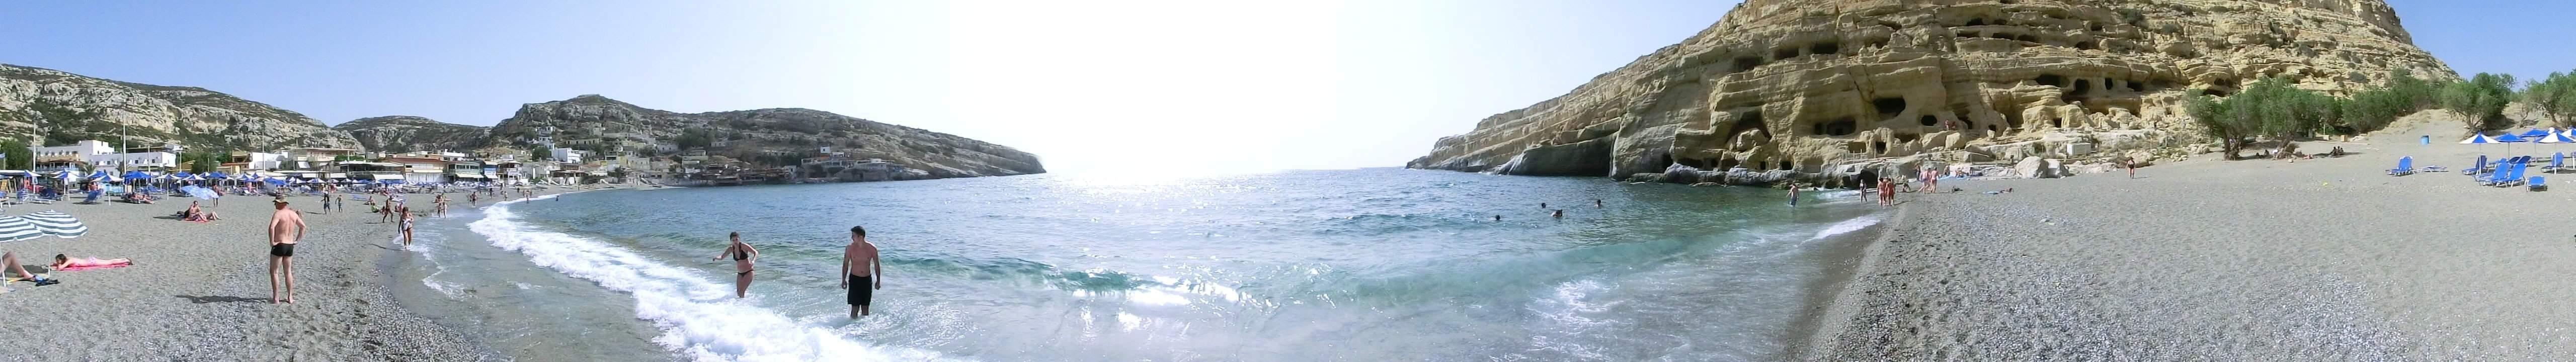 Matala Panorama